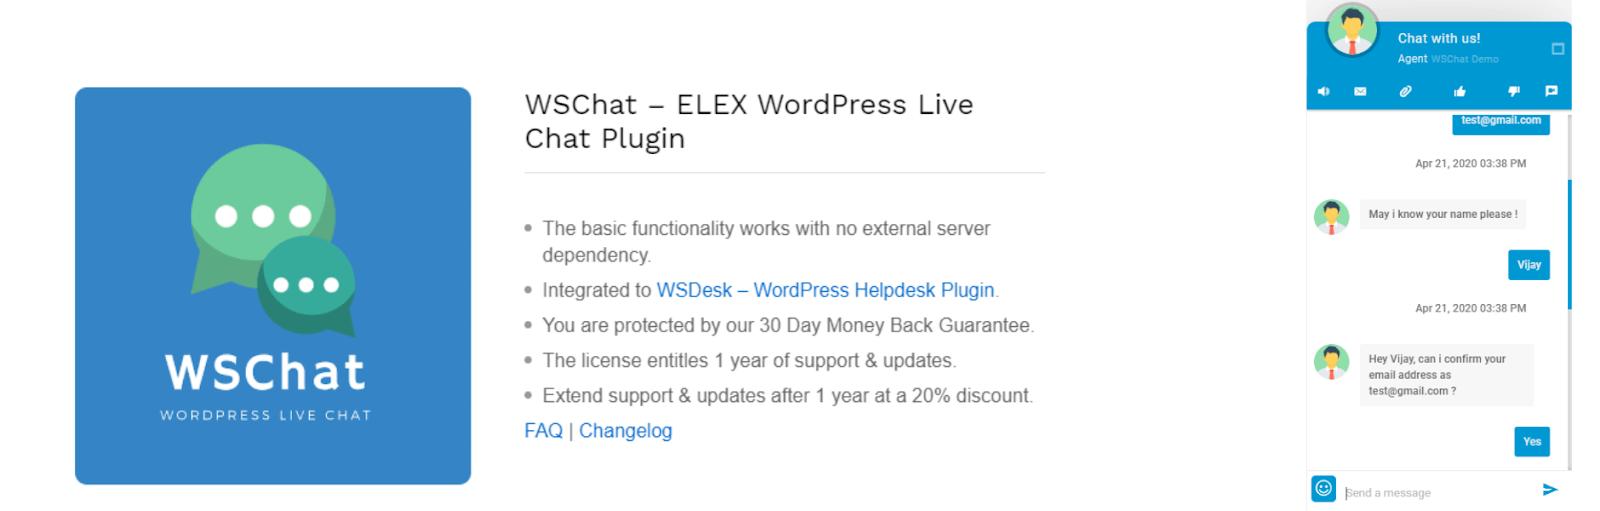 WSChat - ELEX WordPress Live Chat Plugin